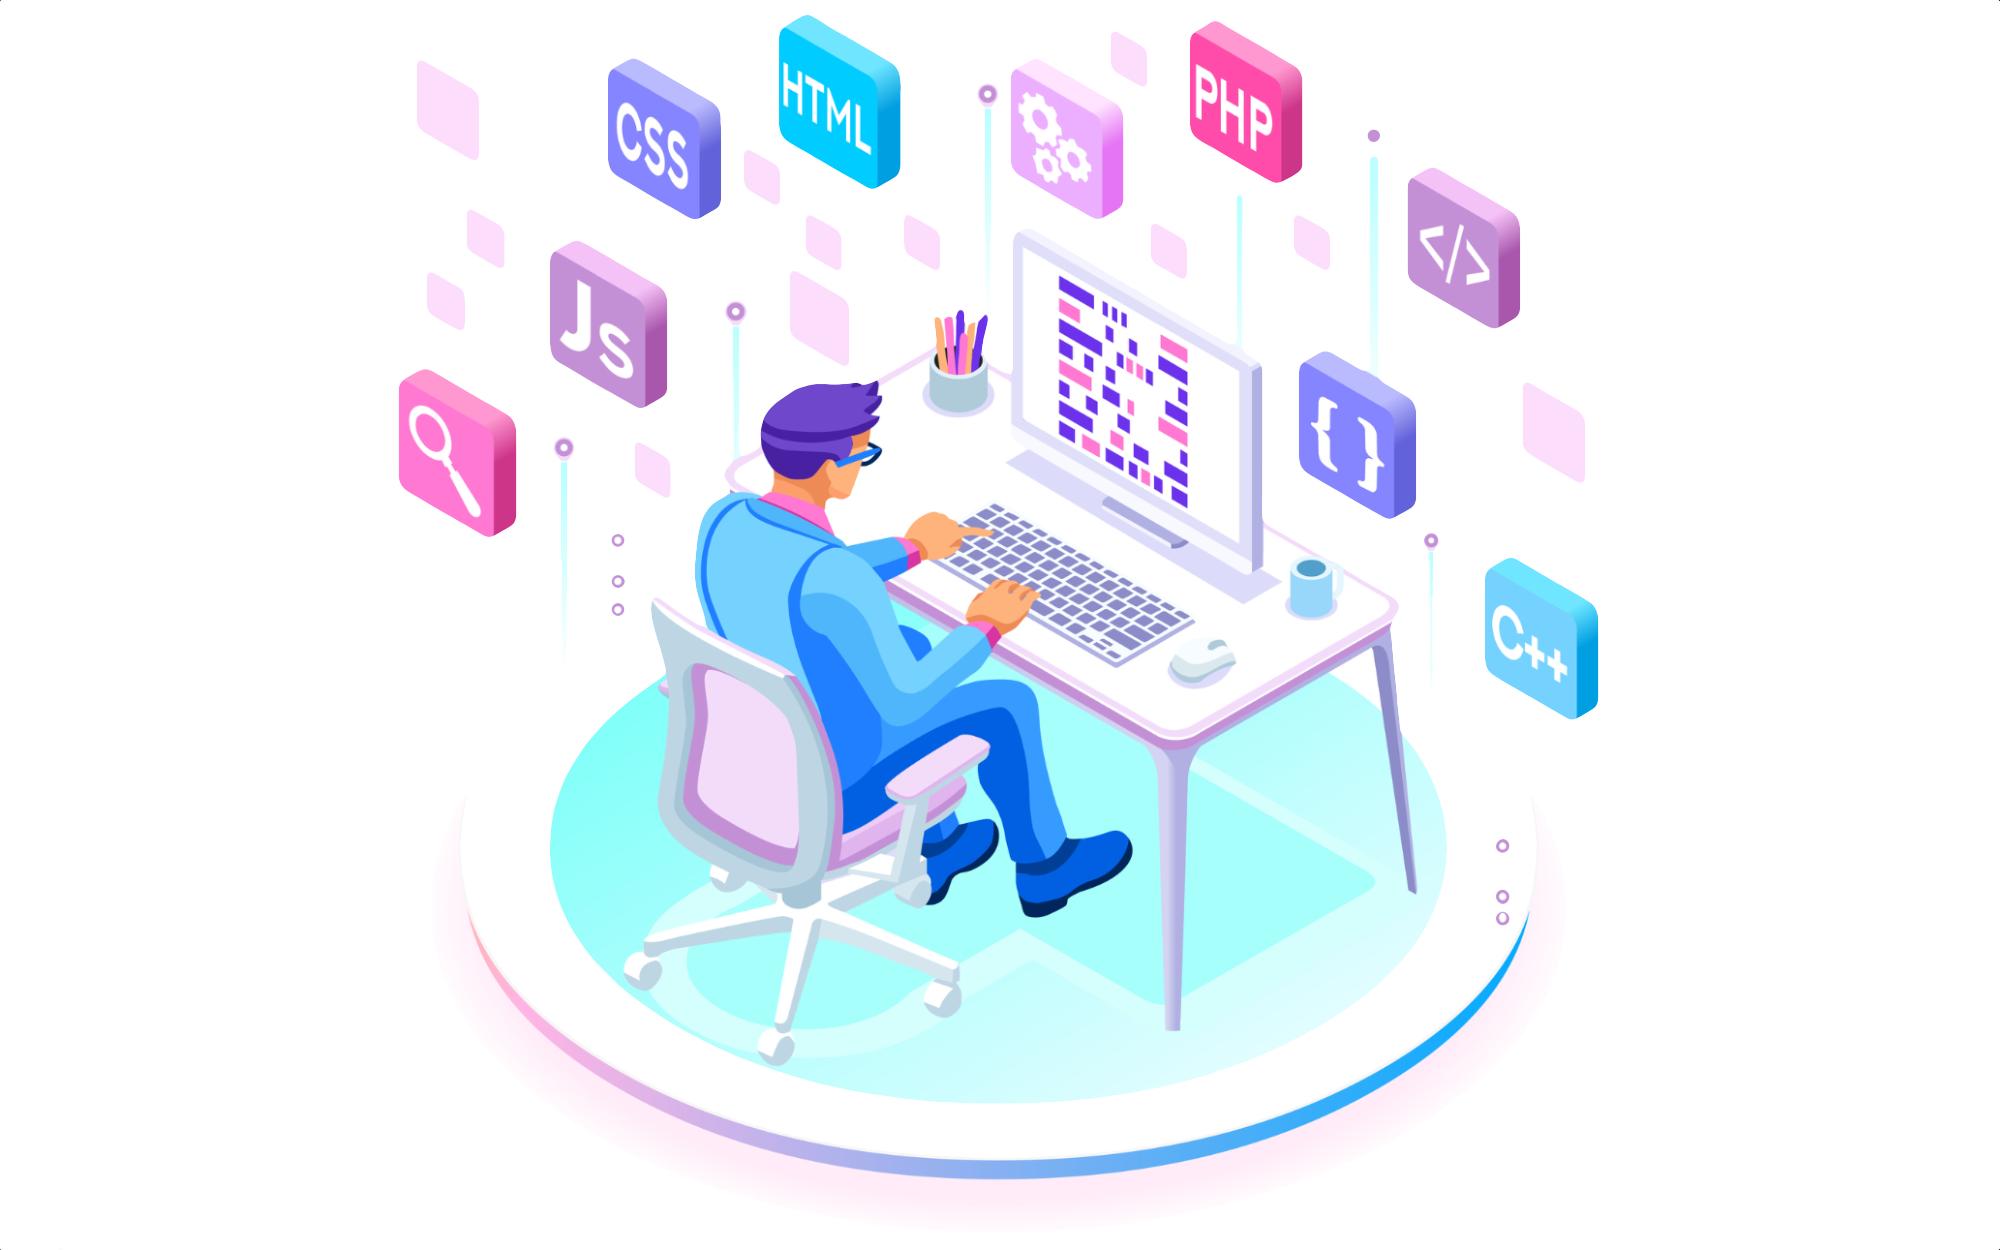 https://cit-program.com/wp-content/uploads/2021/09/Software-Developer-Software-Engineer-Dice.png